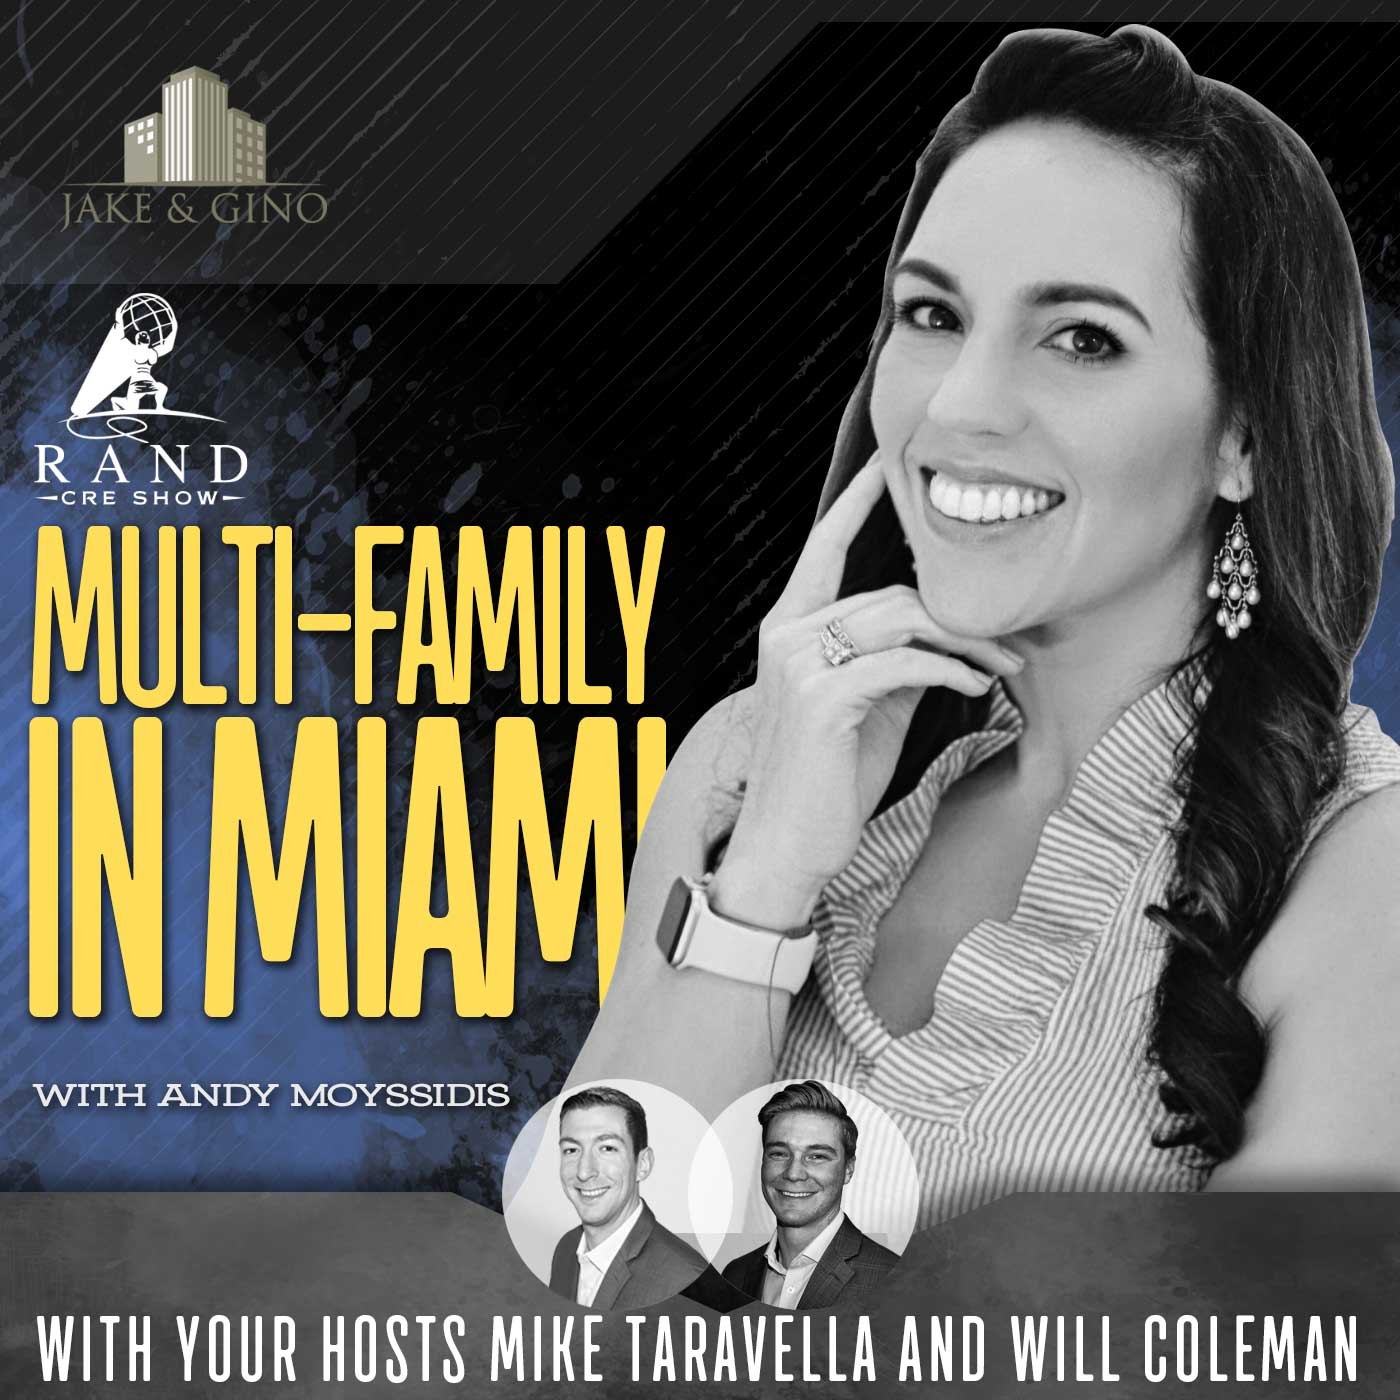 Multi-family in Miami with Andy Moyssidis